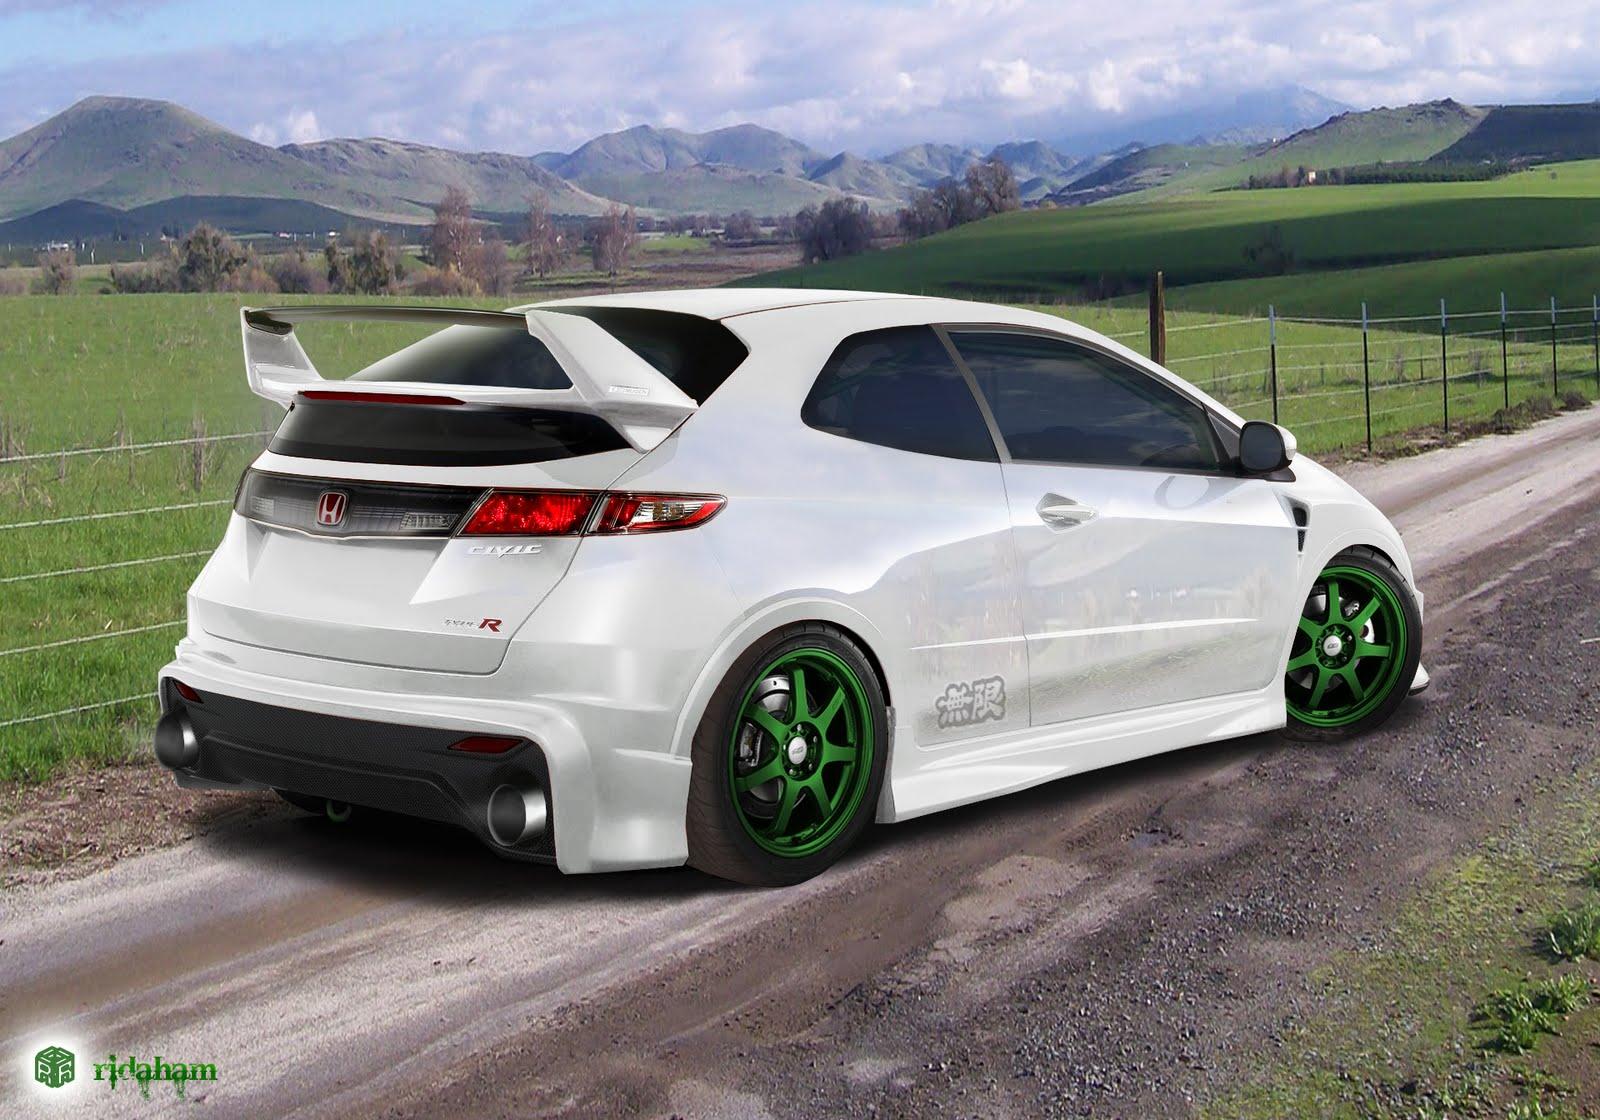 http://2.bp.blogspot.com/-yWGmEg_PYbY/TdaDGVhNJOI/AAAAAAAAAIU/dparT9Xeptk/s1600/Mugen+Honda+Civic+Type+R-ridaham.jpg